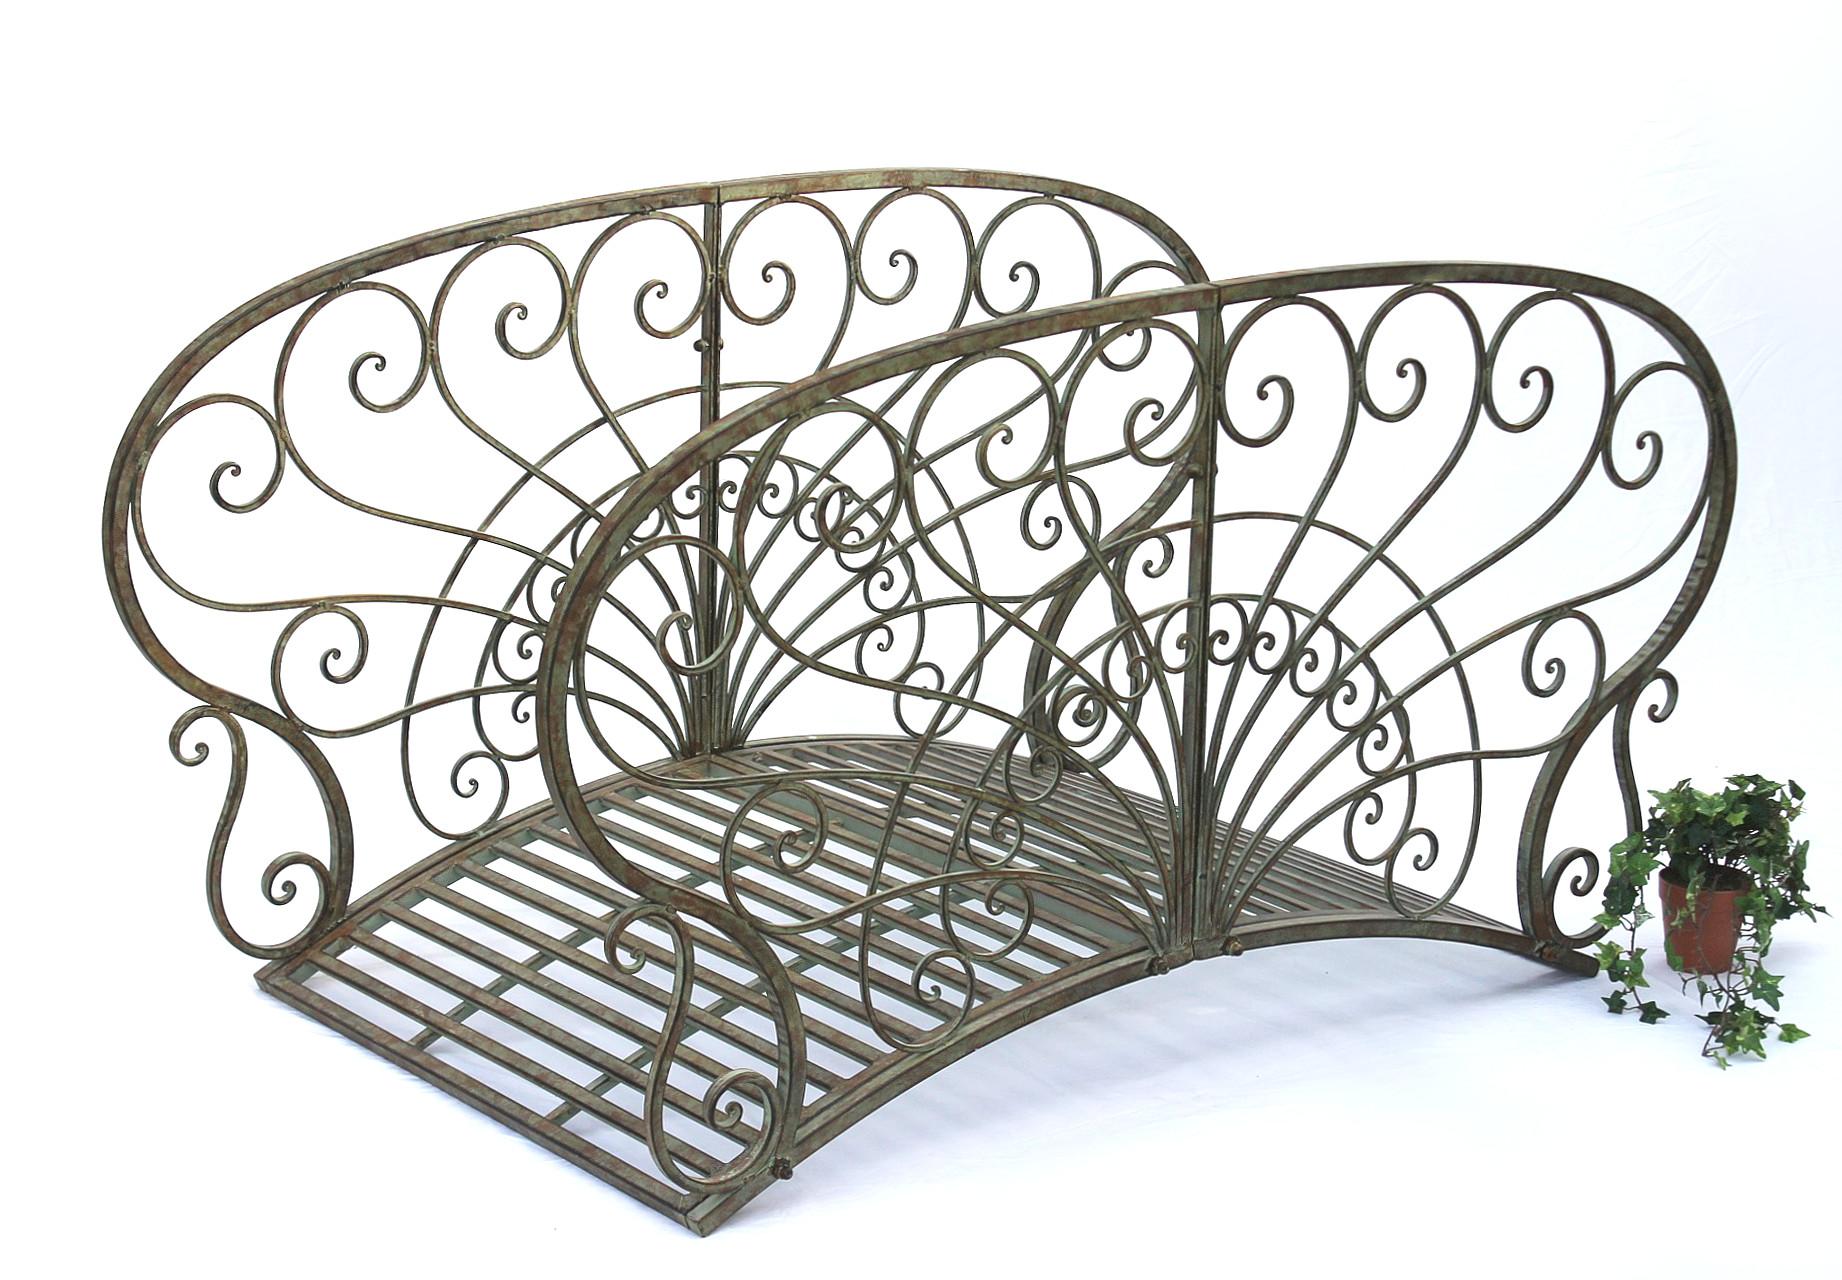 br cke aus metall jc150106 gartenbr cke 150cm metallbr cke teichbr cke steg ebay. Black Bedroom Furniture Sets. Home Design Ideas